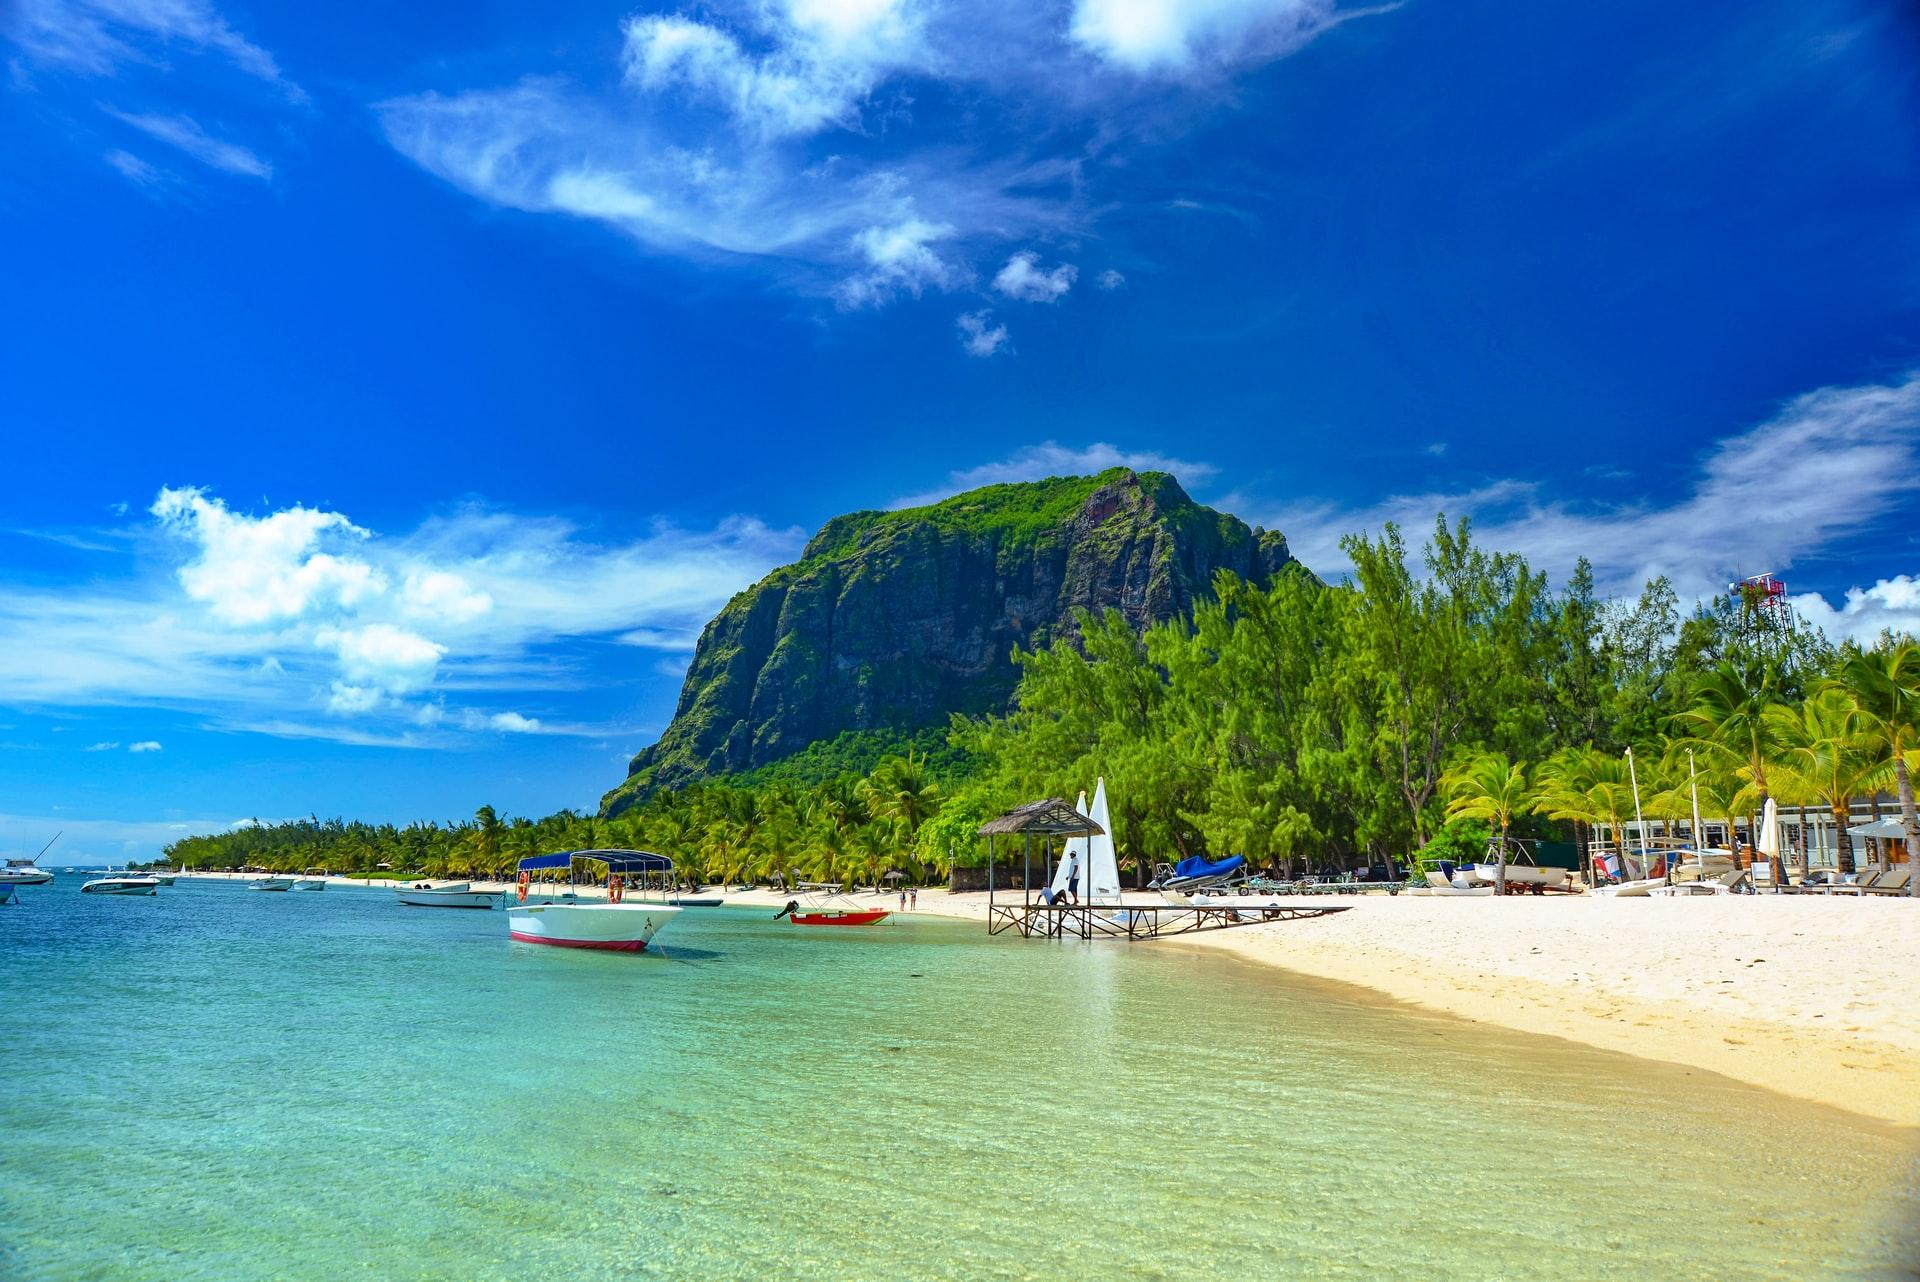 Mauritius Drops Quarantine And Welcomes International Tourists